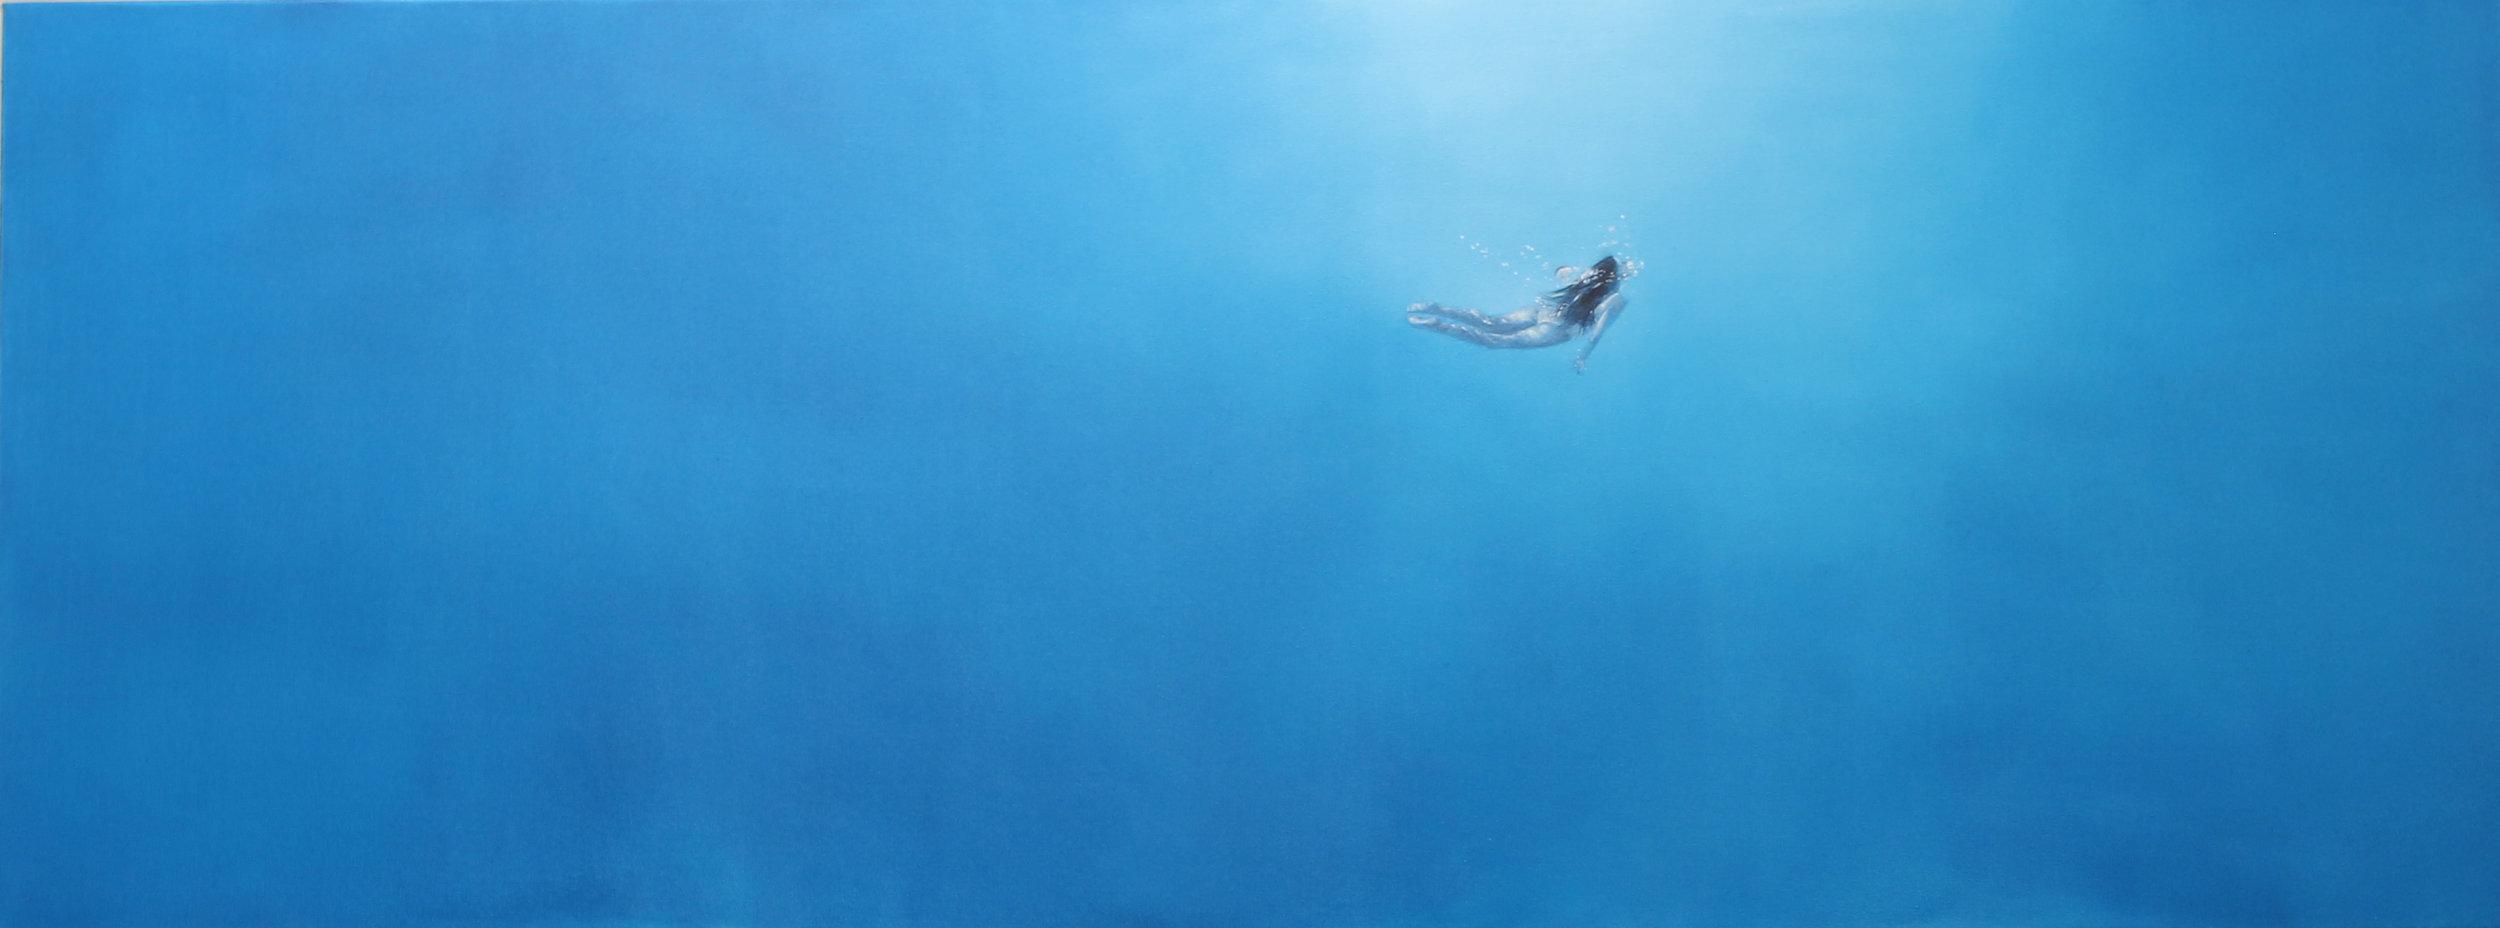 blue silence baja 2017.jpg